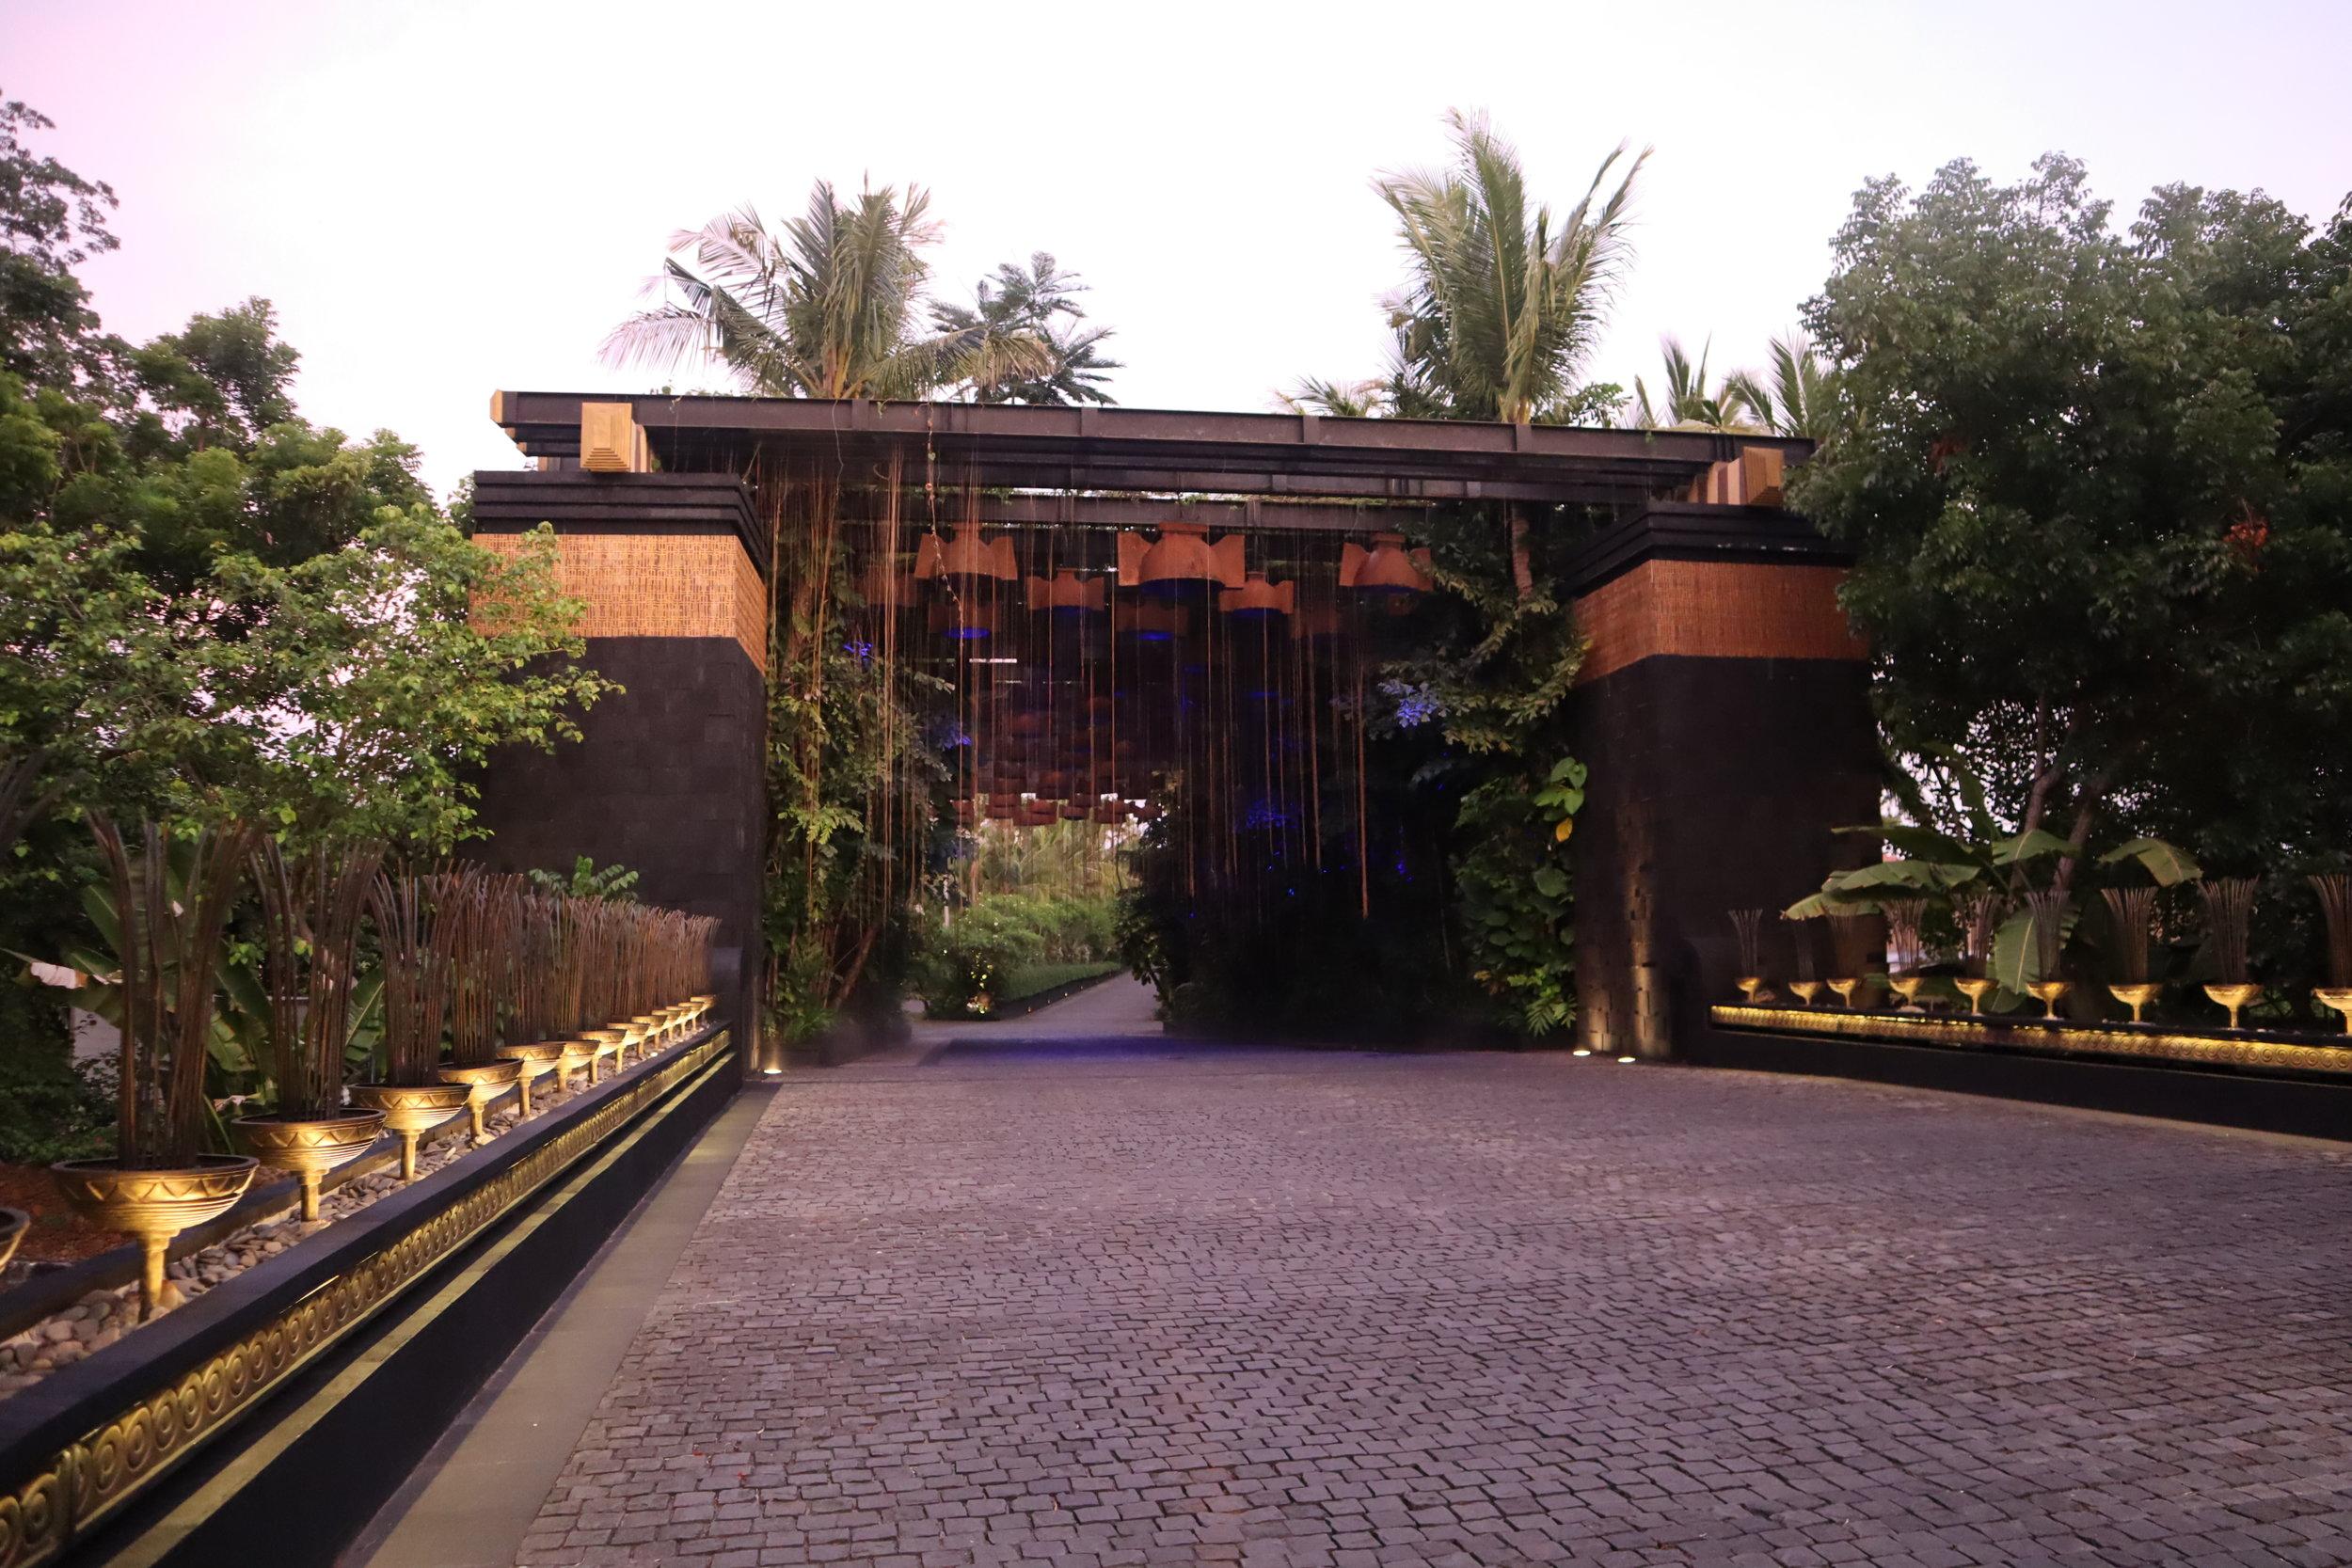 St. Regis Bali – Entryway